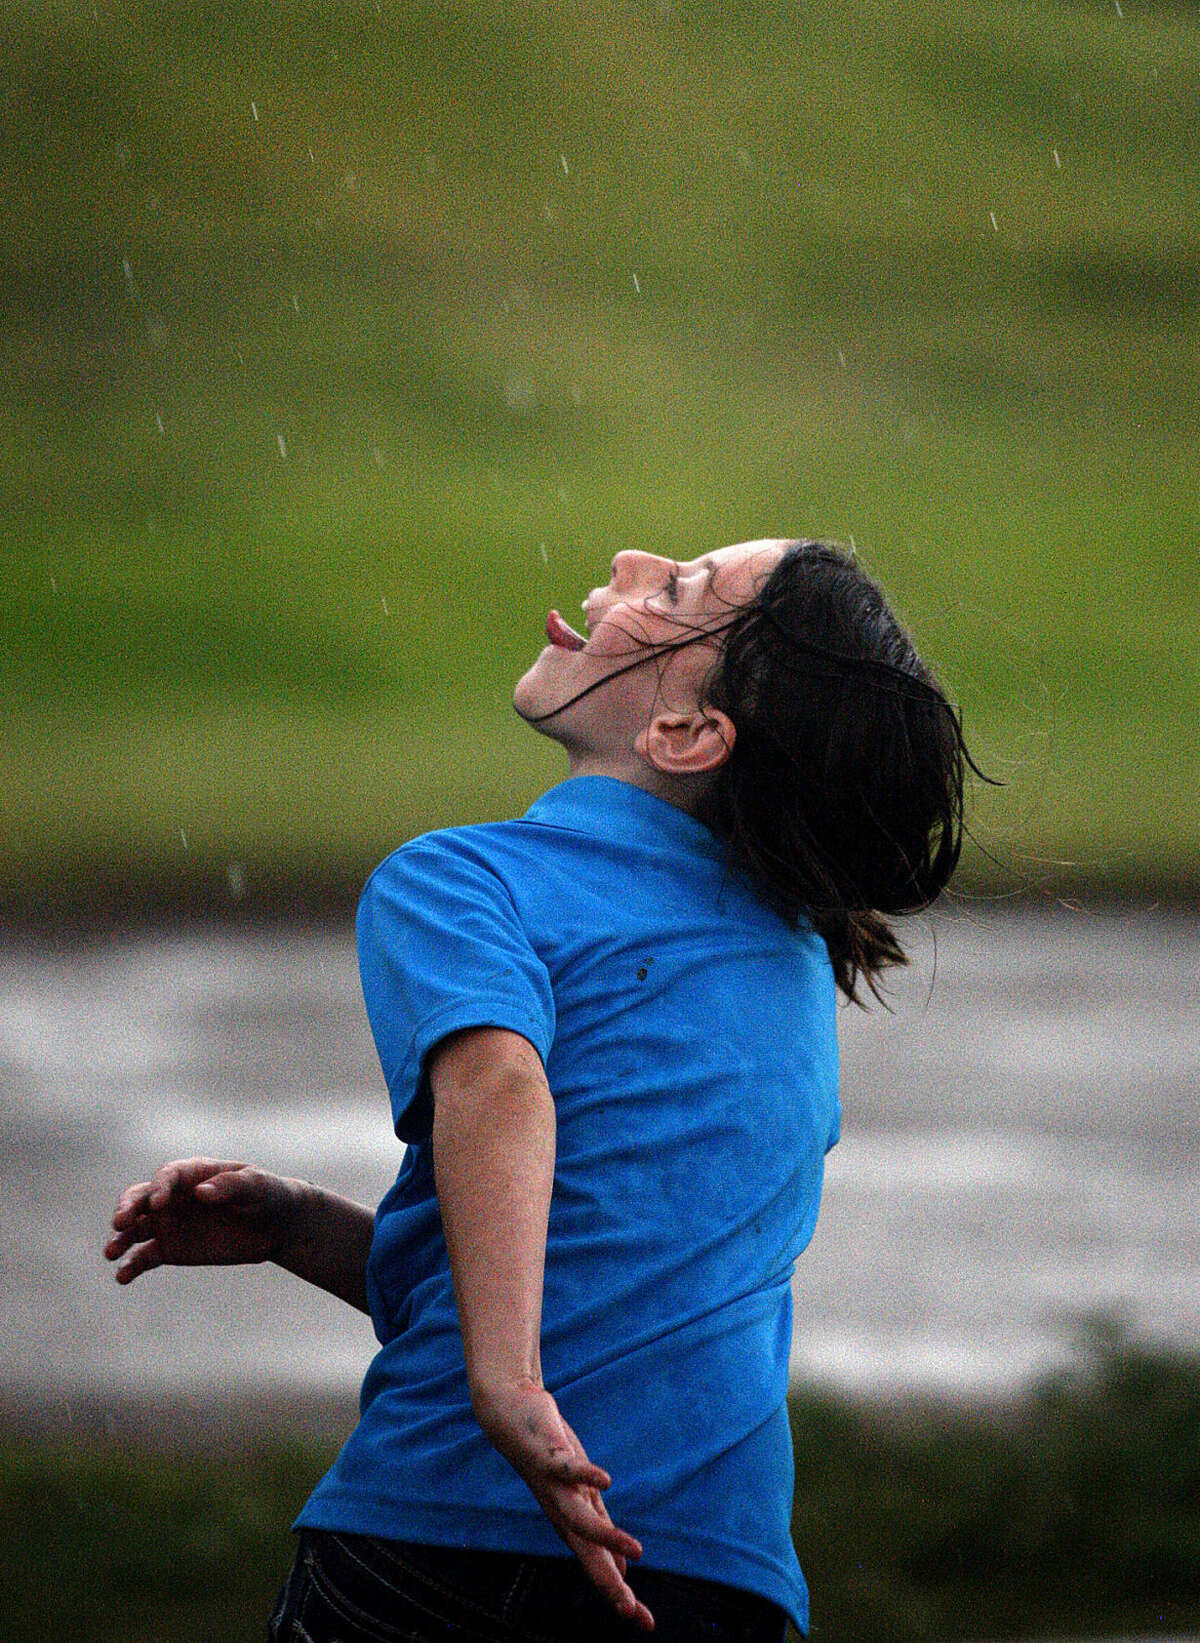 Hope Gleghorn, age 8, catches rain drops at Hogan Park Golf Course as a thunderstorm rolls through the Permian Basin on Friday, June 12, 2015. James Durbin/Reporter-Telegram